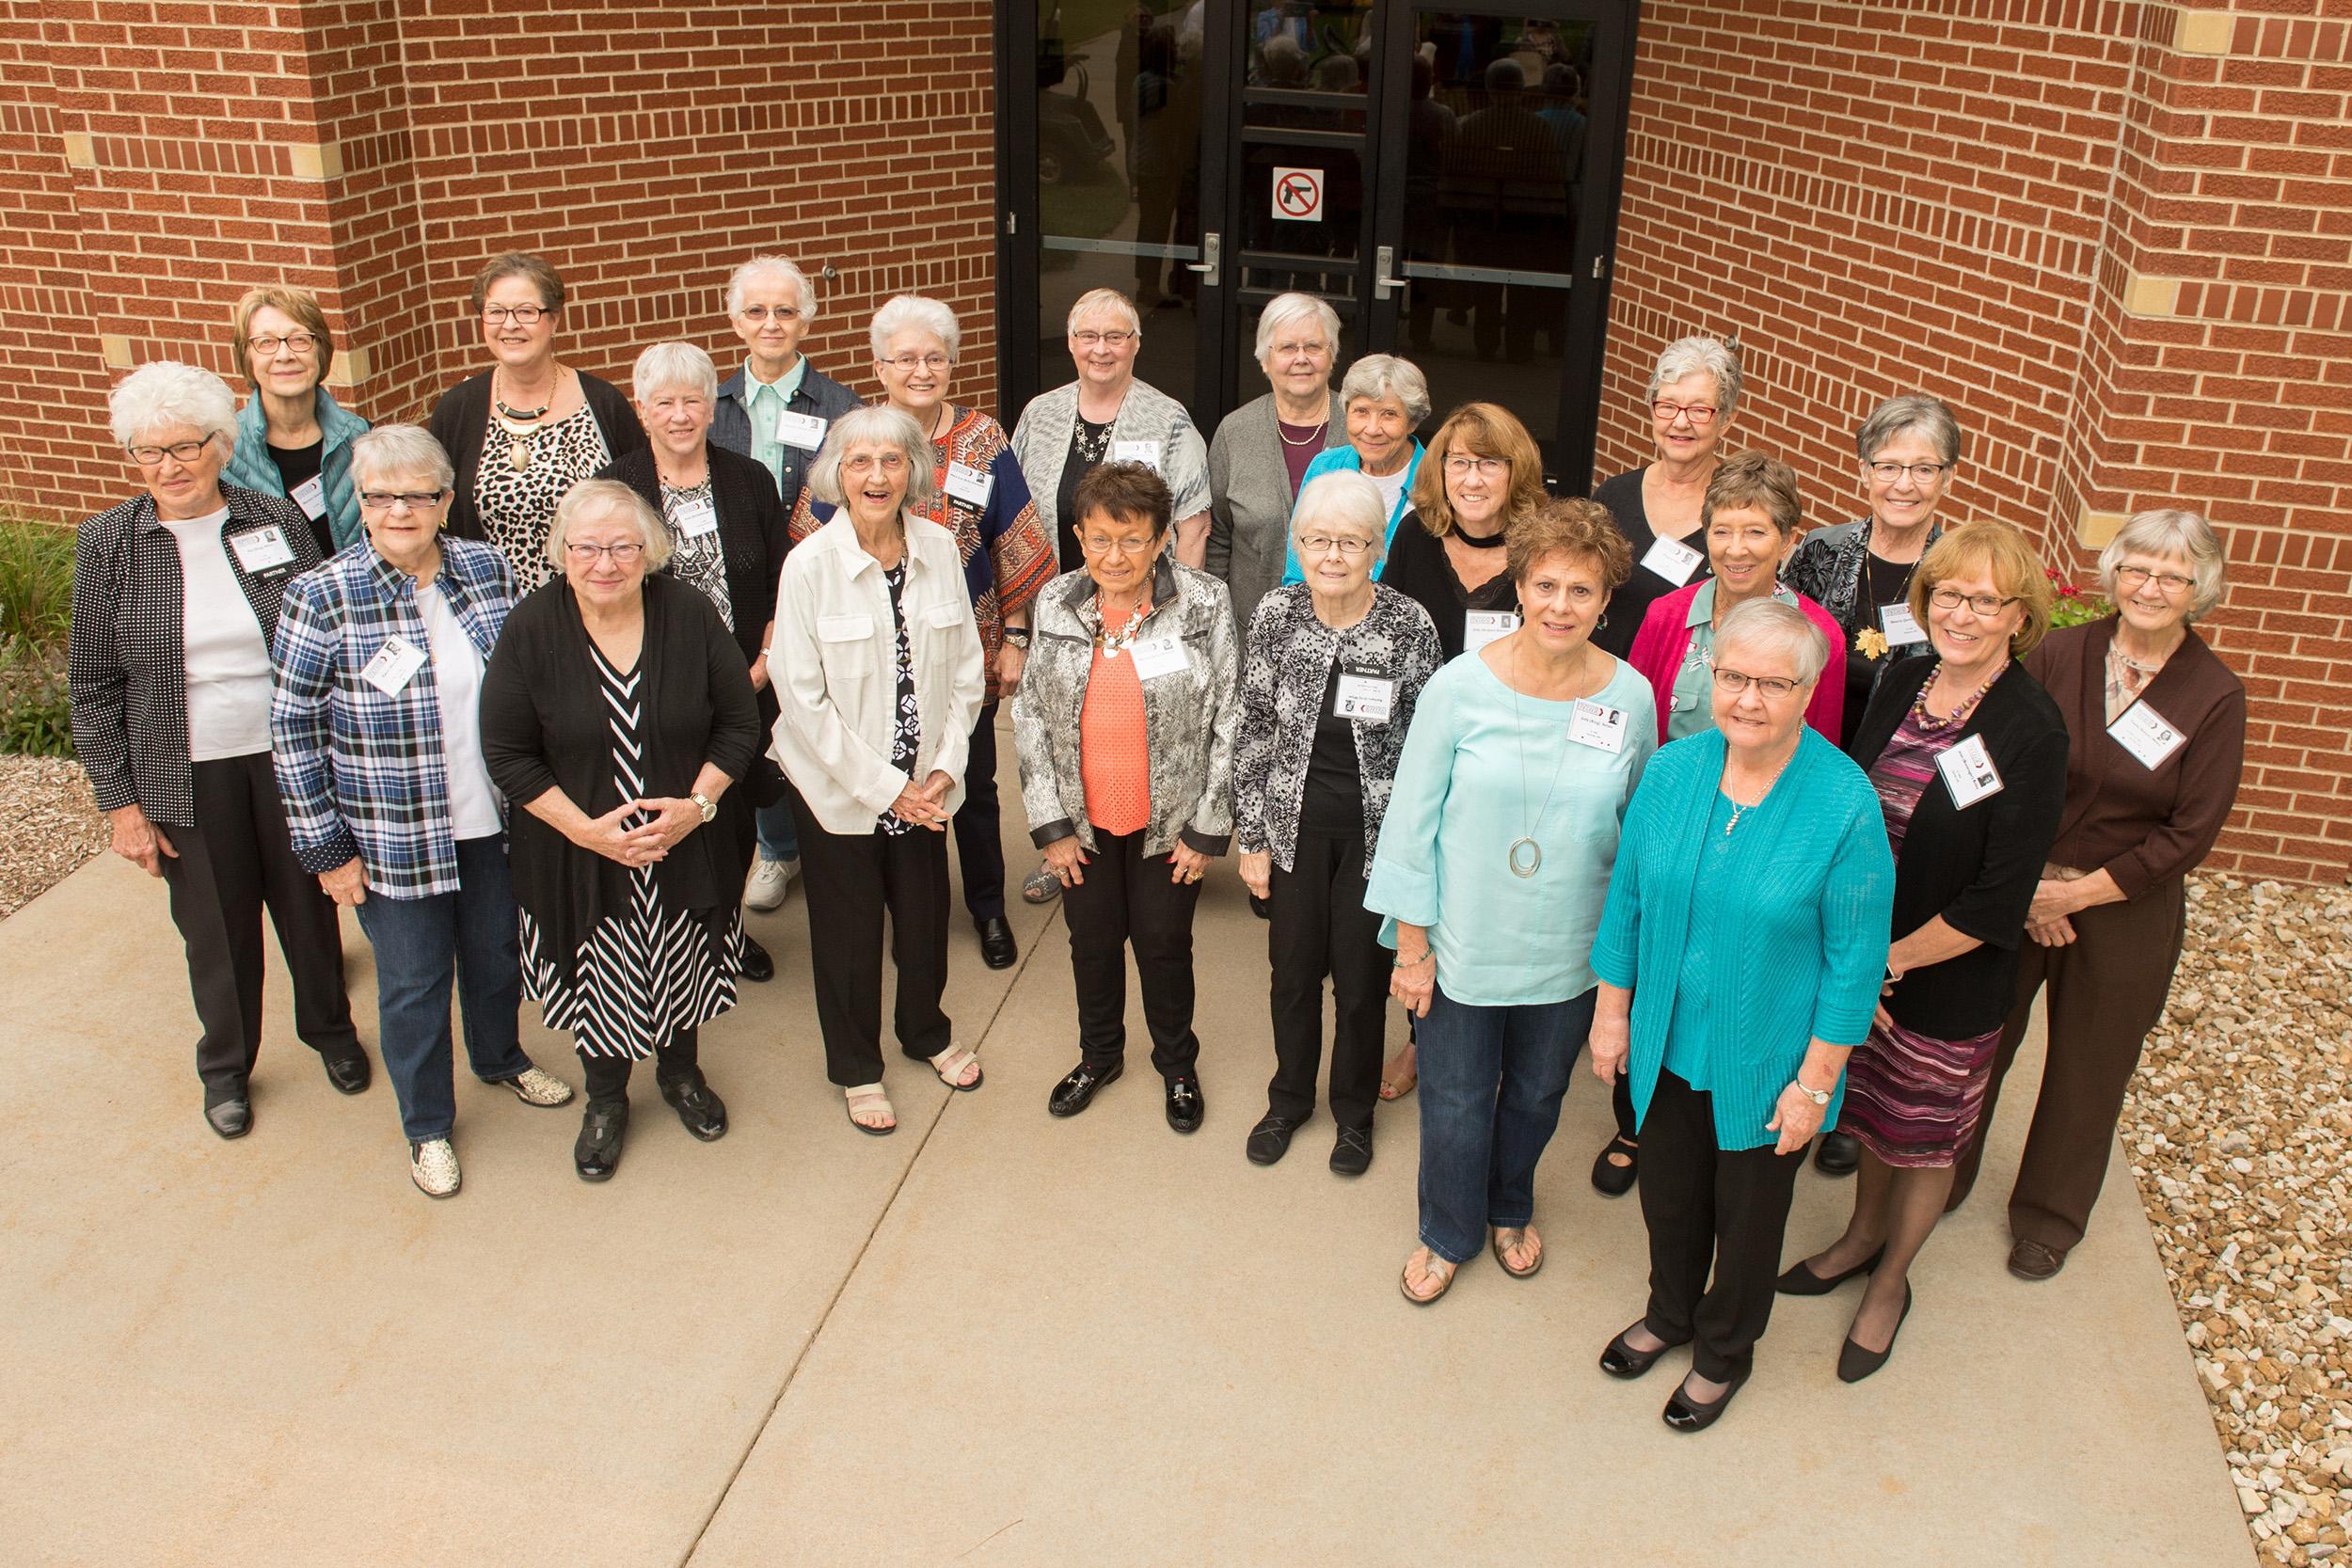 Hesston College - Kansas City General Hospital nursing graduates gather for a photo